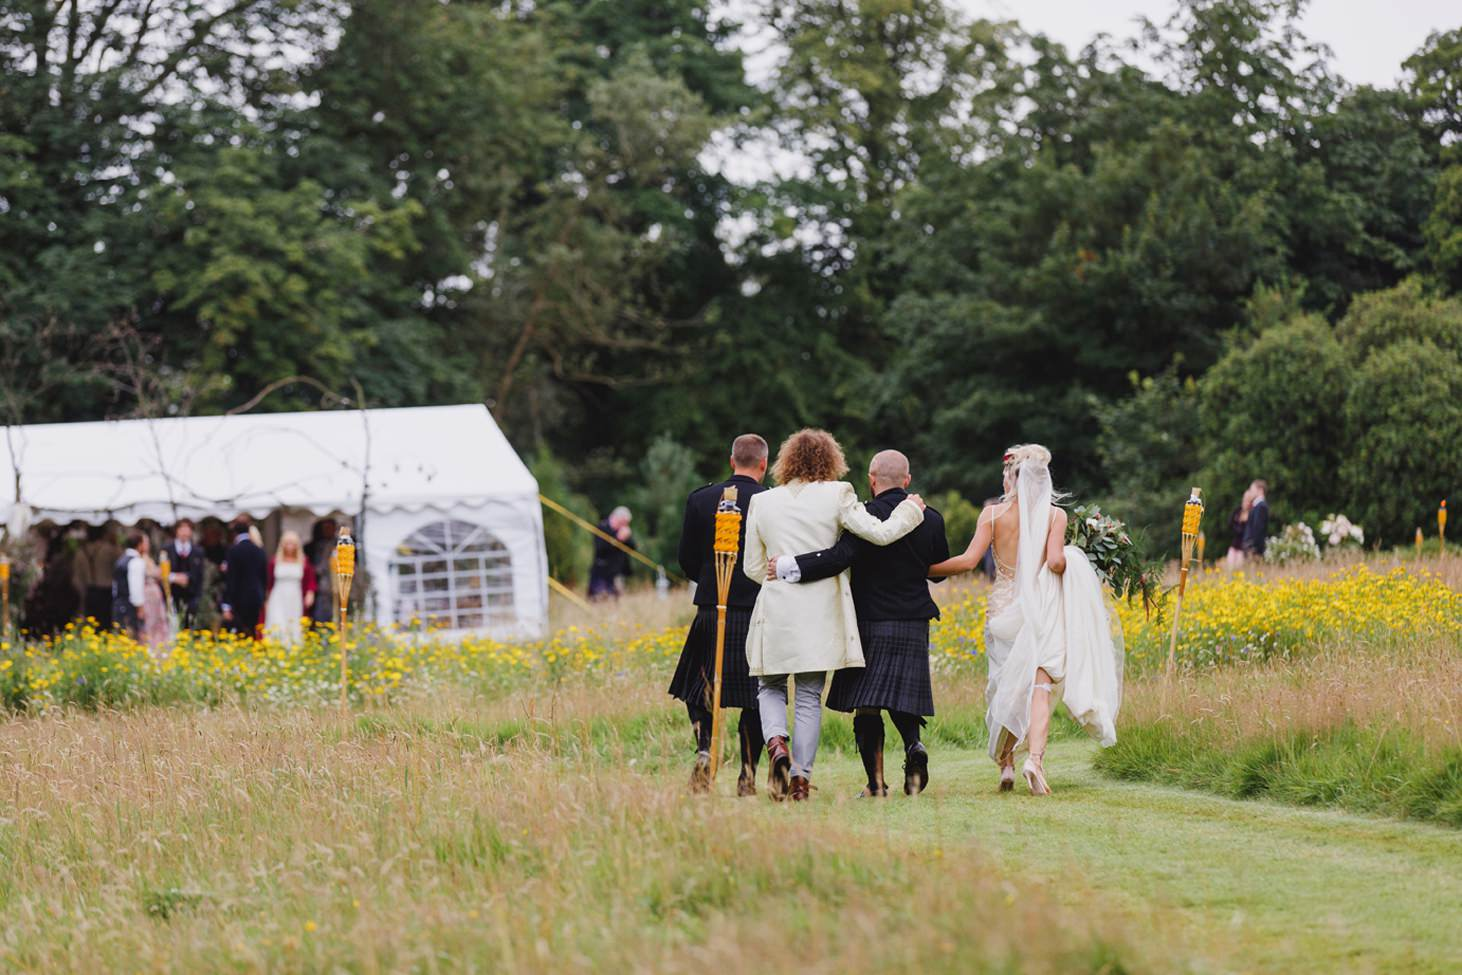 mount stuart wedding photography outdoor wedding reception